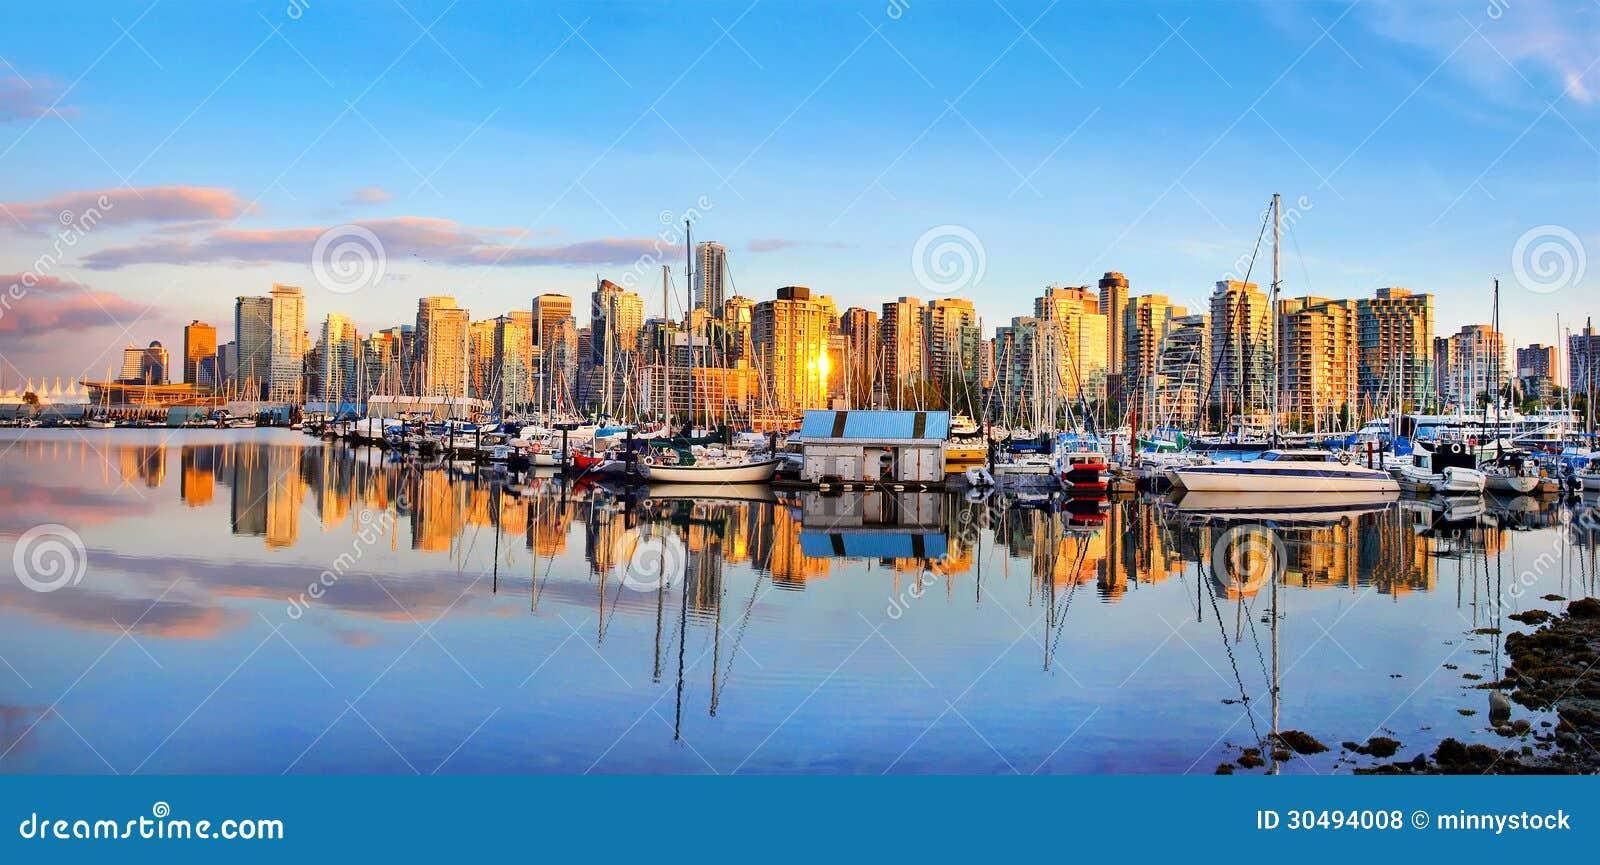 Vancouver skyline panorama at sunset, British Columbia, Canada